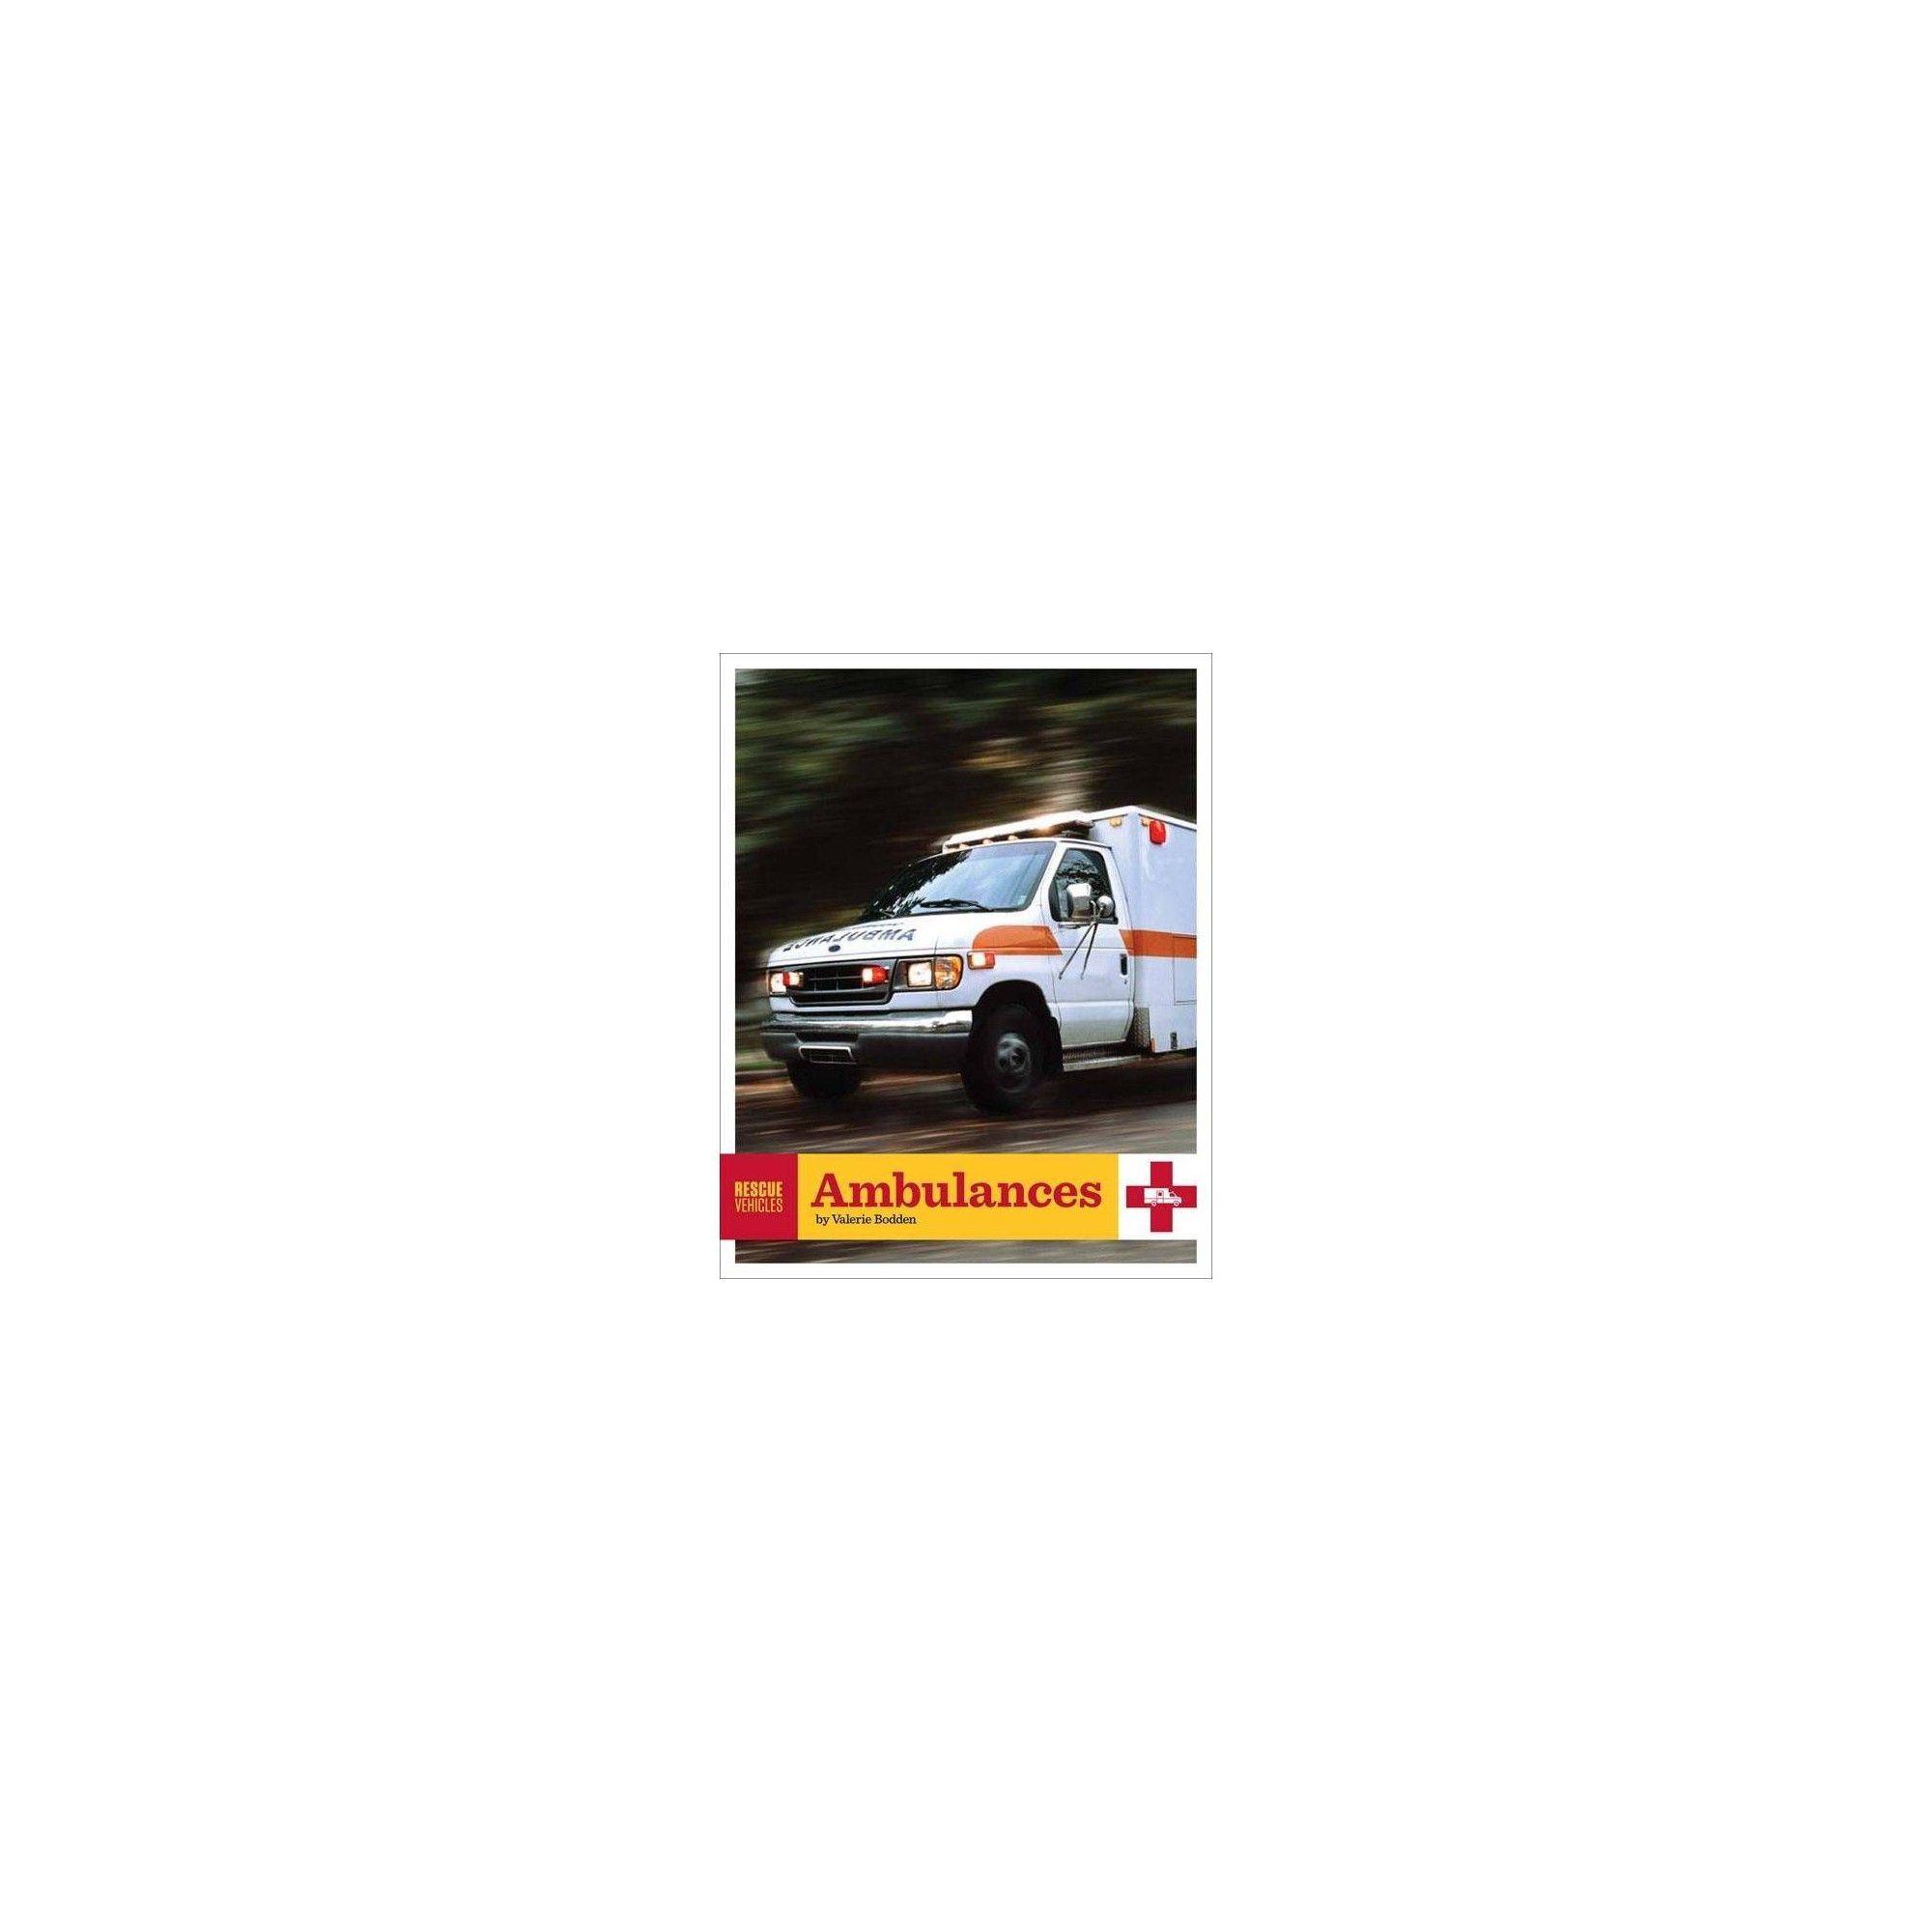 Ambulances (Rescue Vehicles (Paperback)) by Valerie